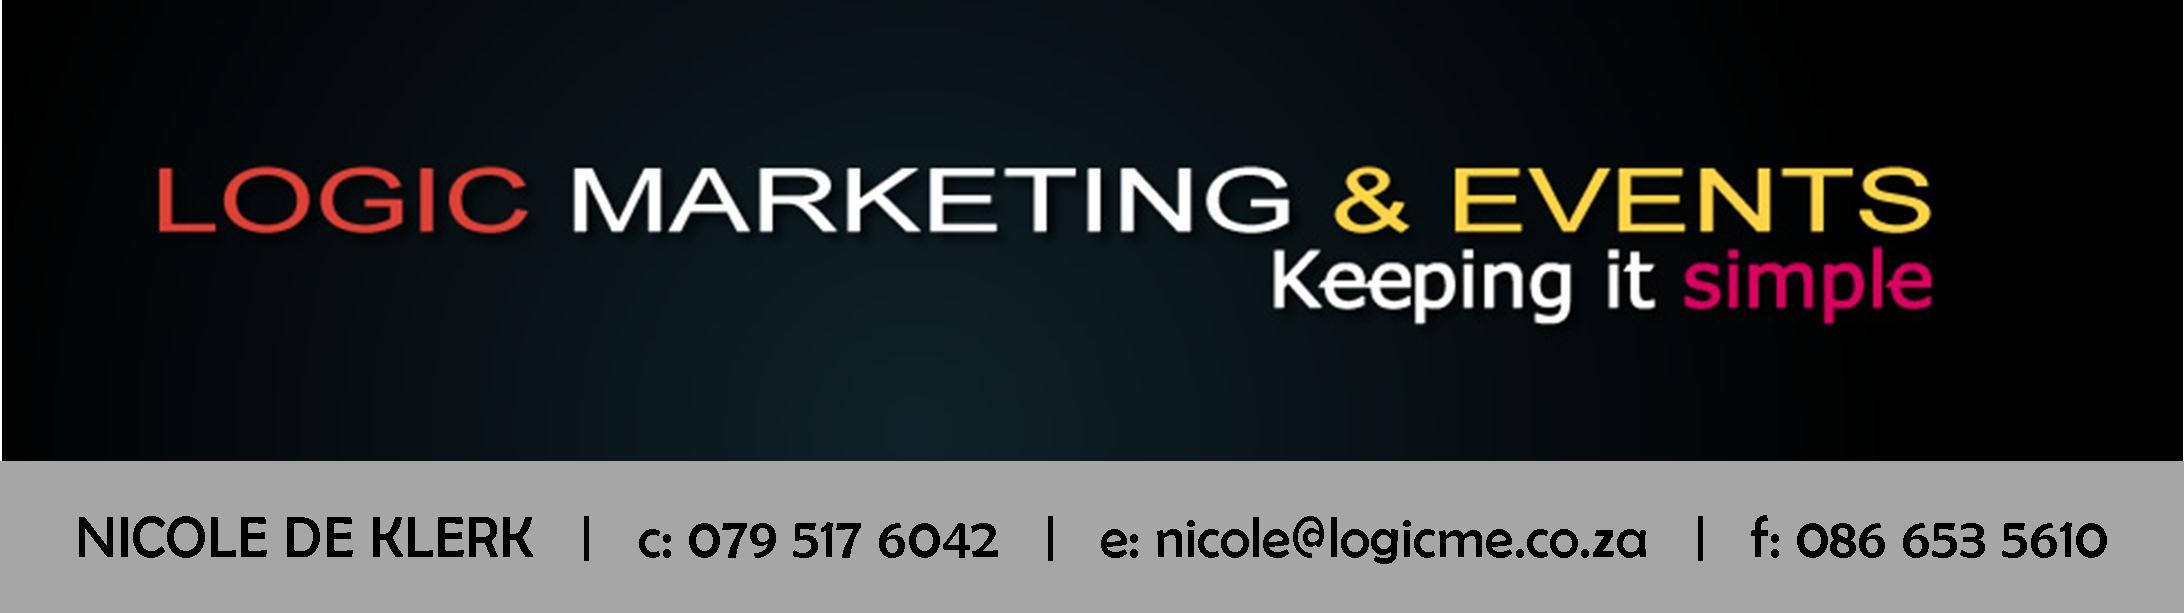 Logic Marketing & Events